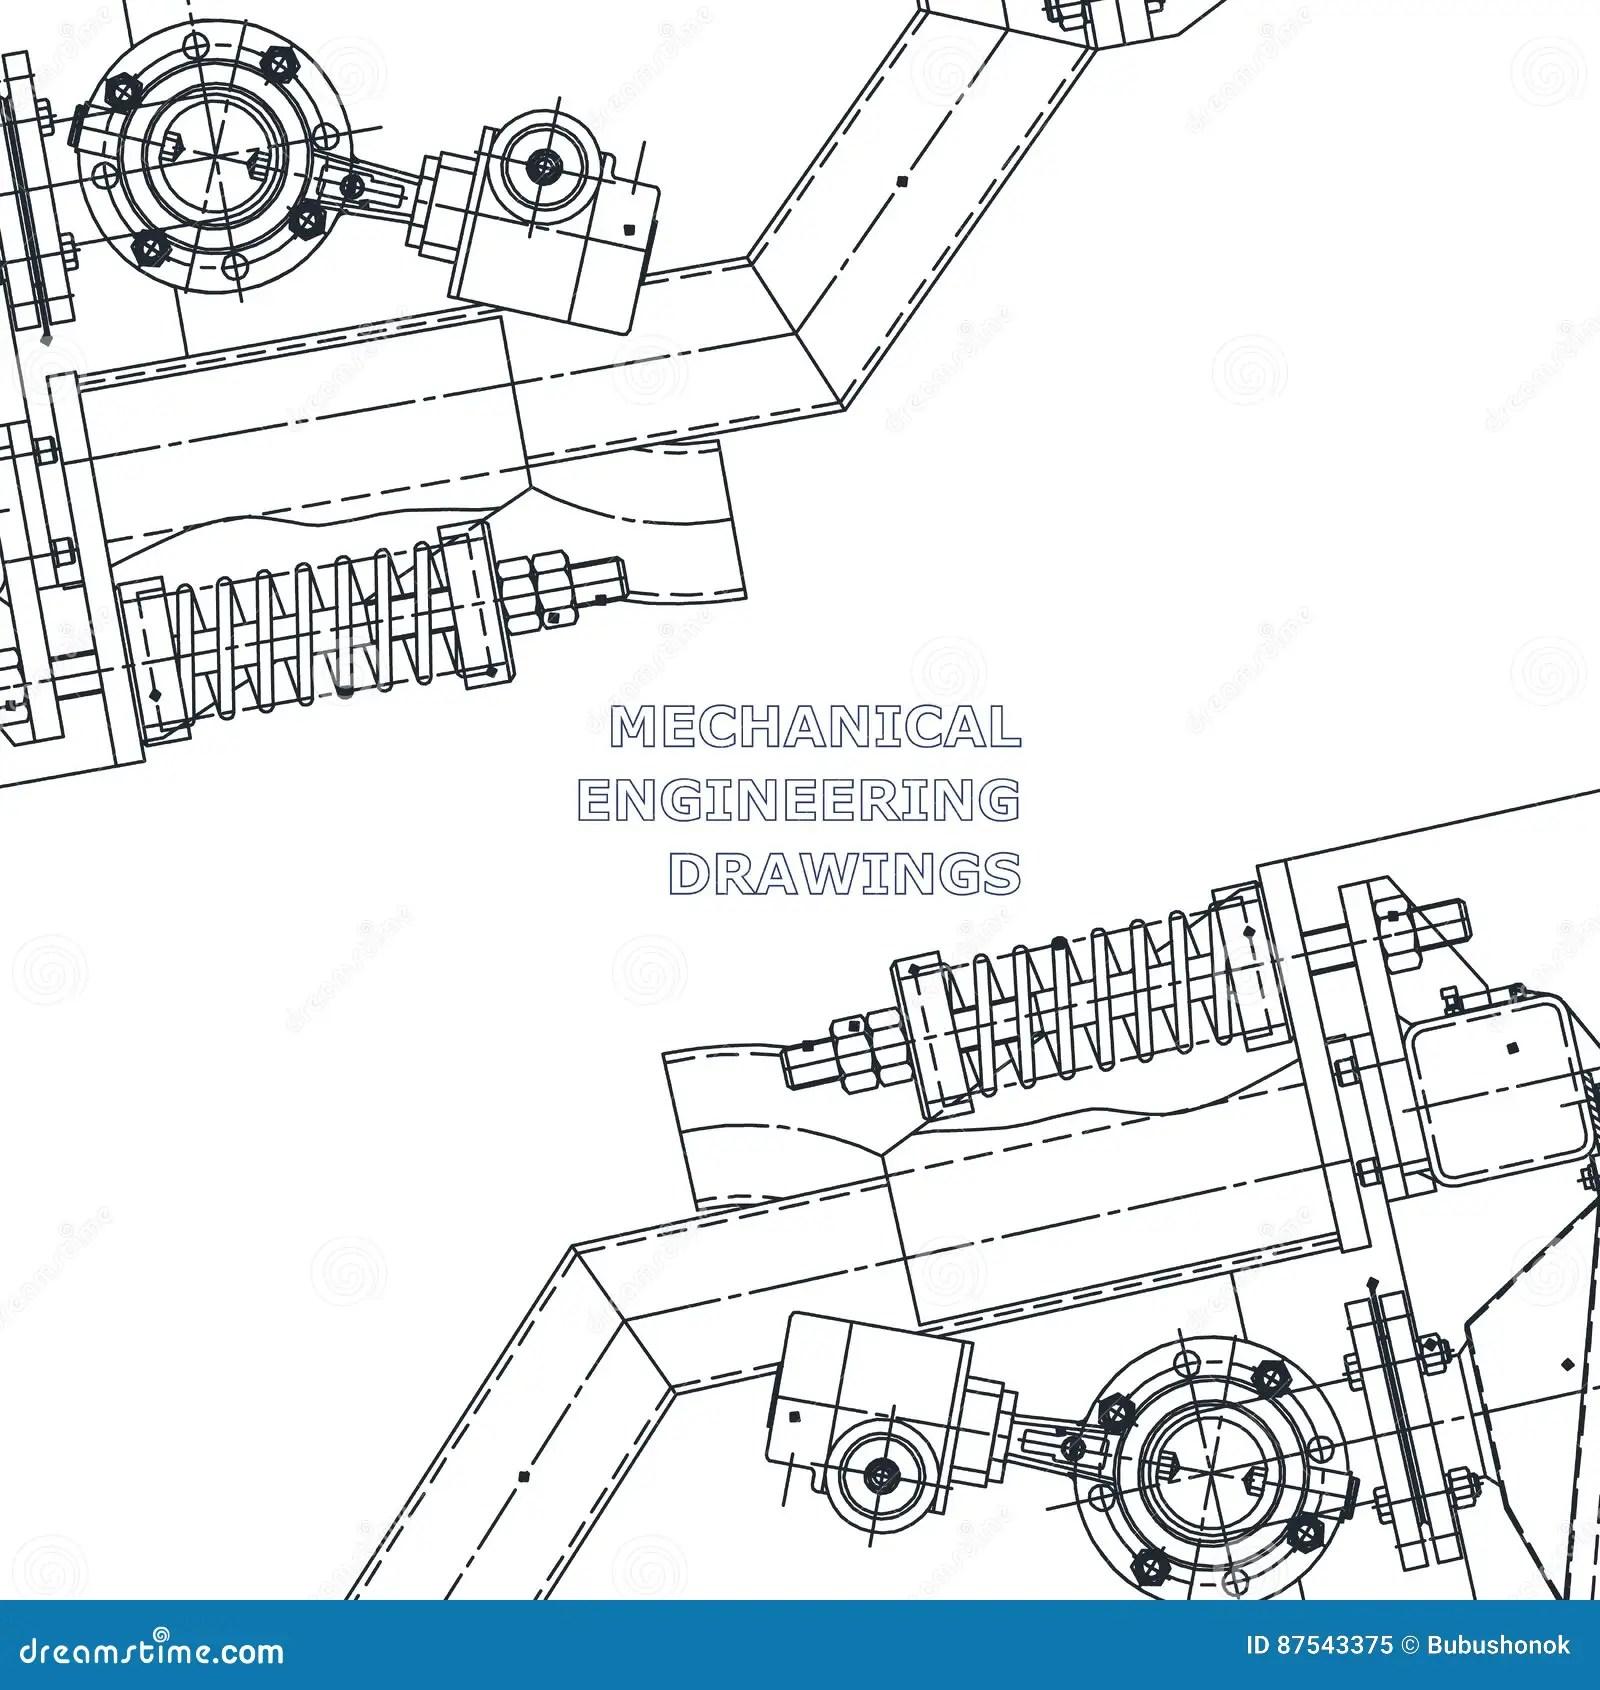 Mechanical Engineering Factory